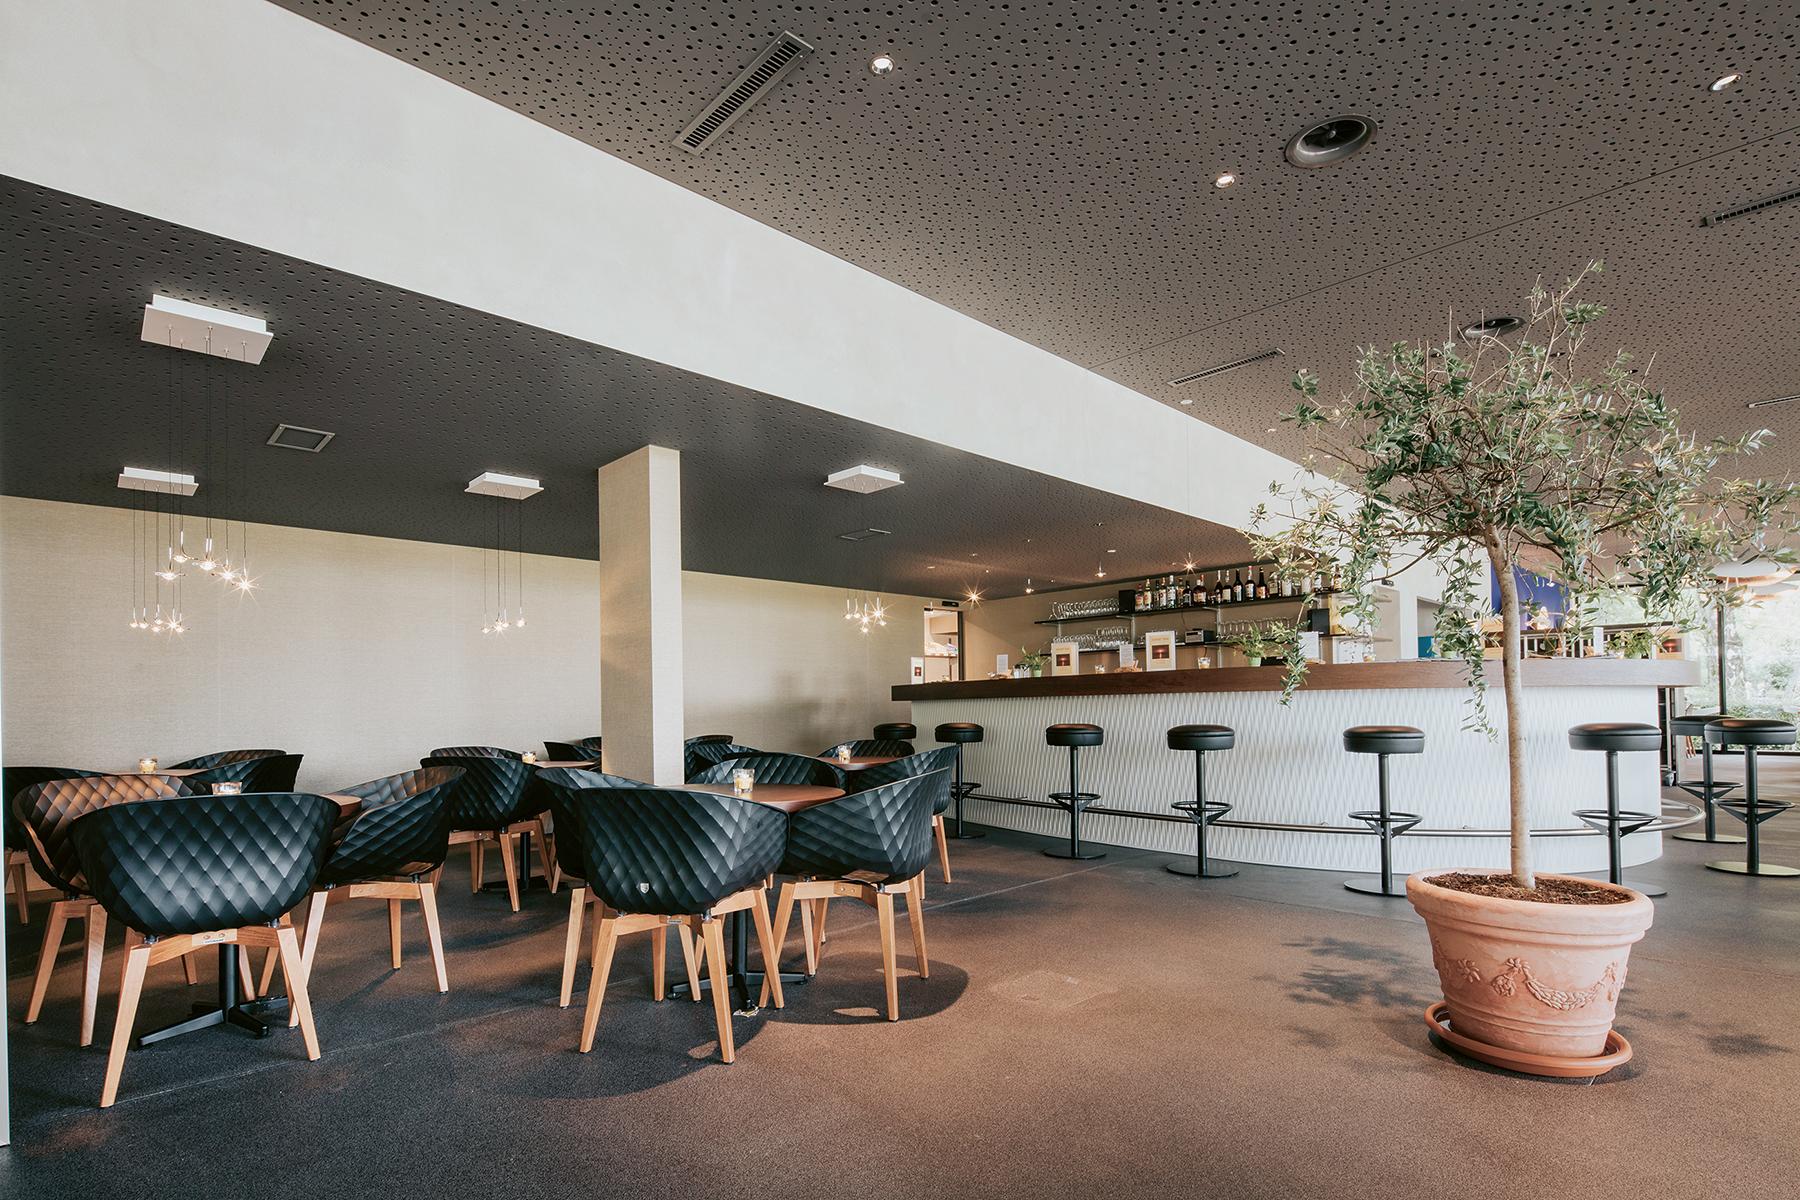 Charmant Bar In Die Wand Eingebauten Galerie - Images for ...